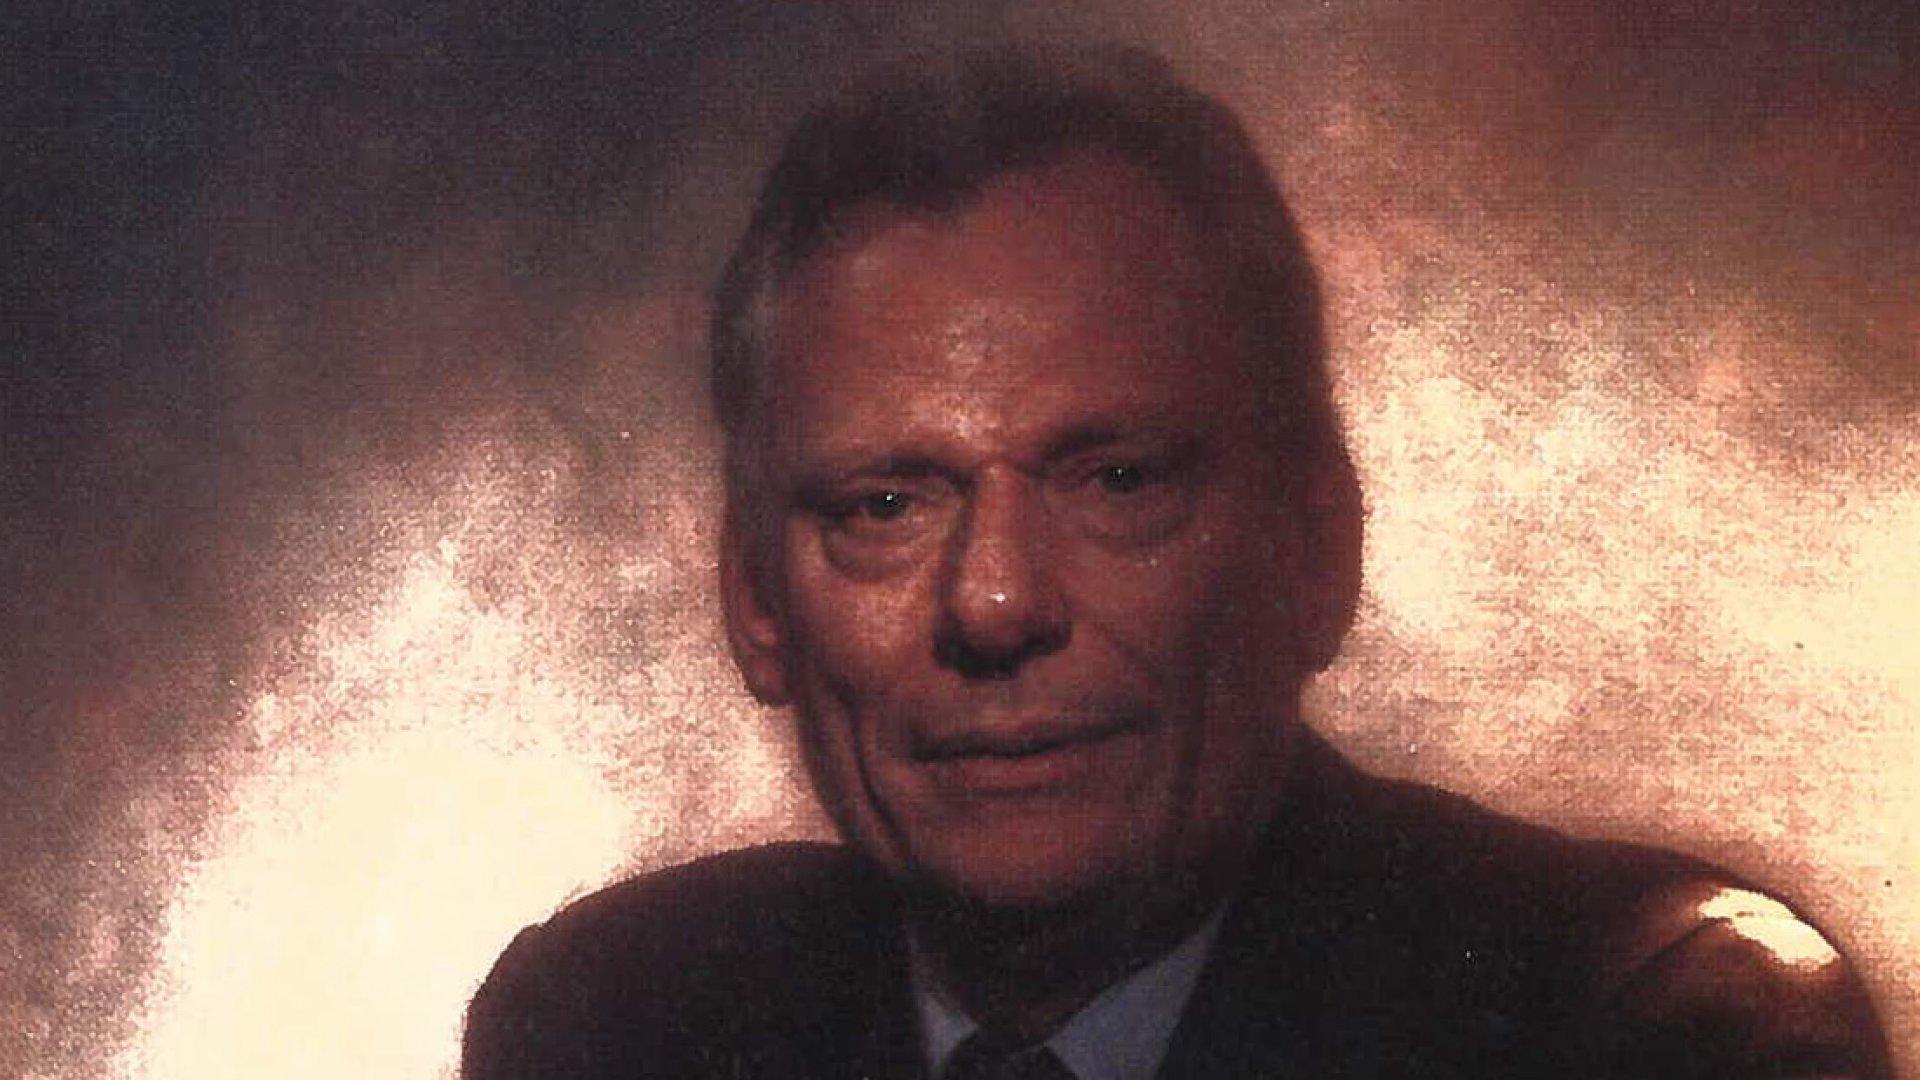 Captain Marvel: How Southwest's Herb Kelleher Keeps Loyalty Sky High (1992 Profile)